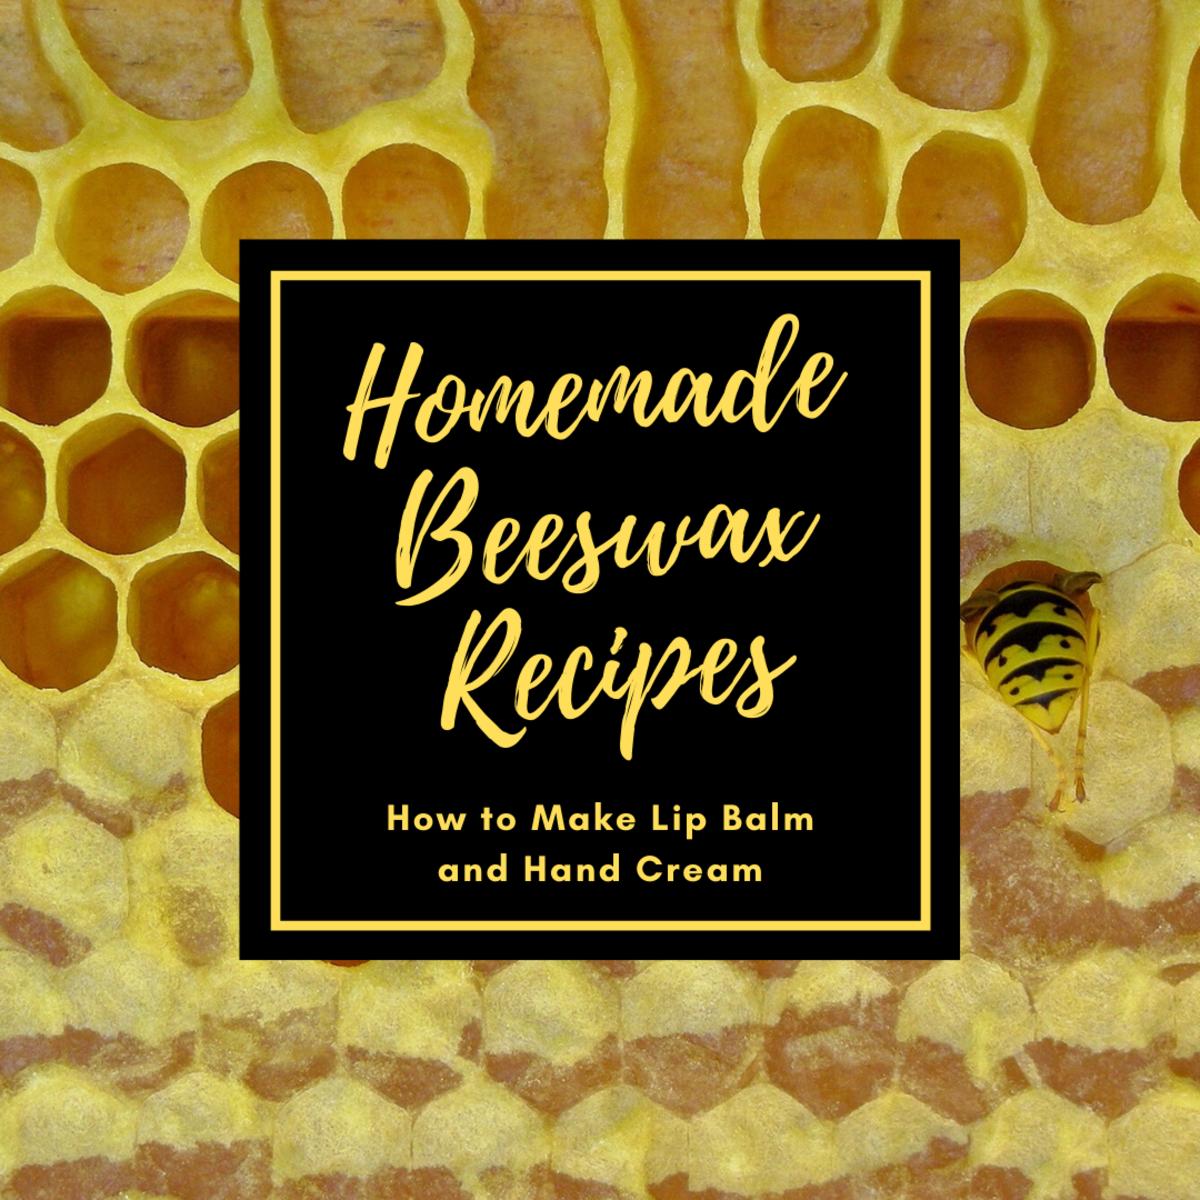 Beeswax Hand Cream and Lip Balm Recipes